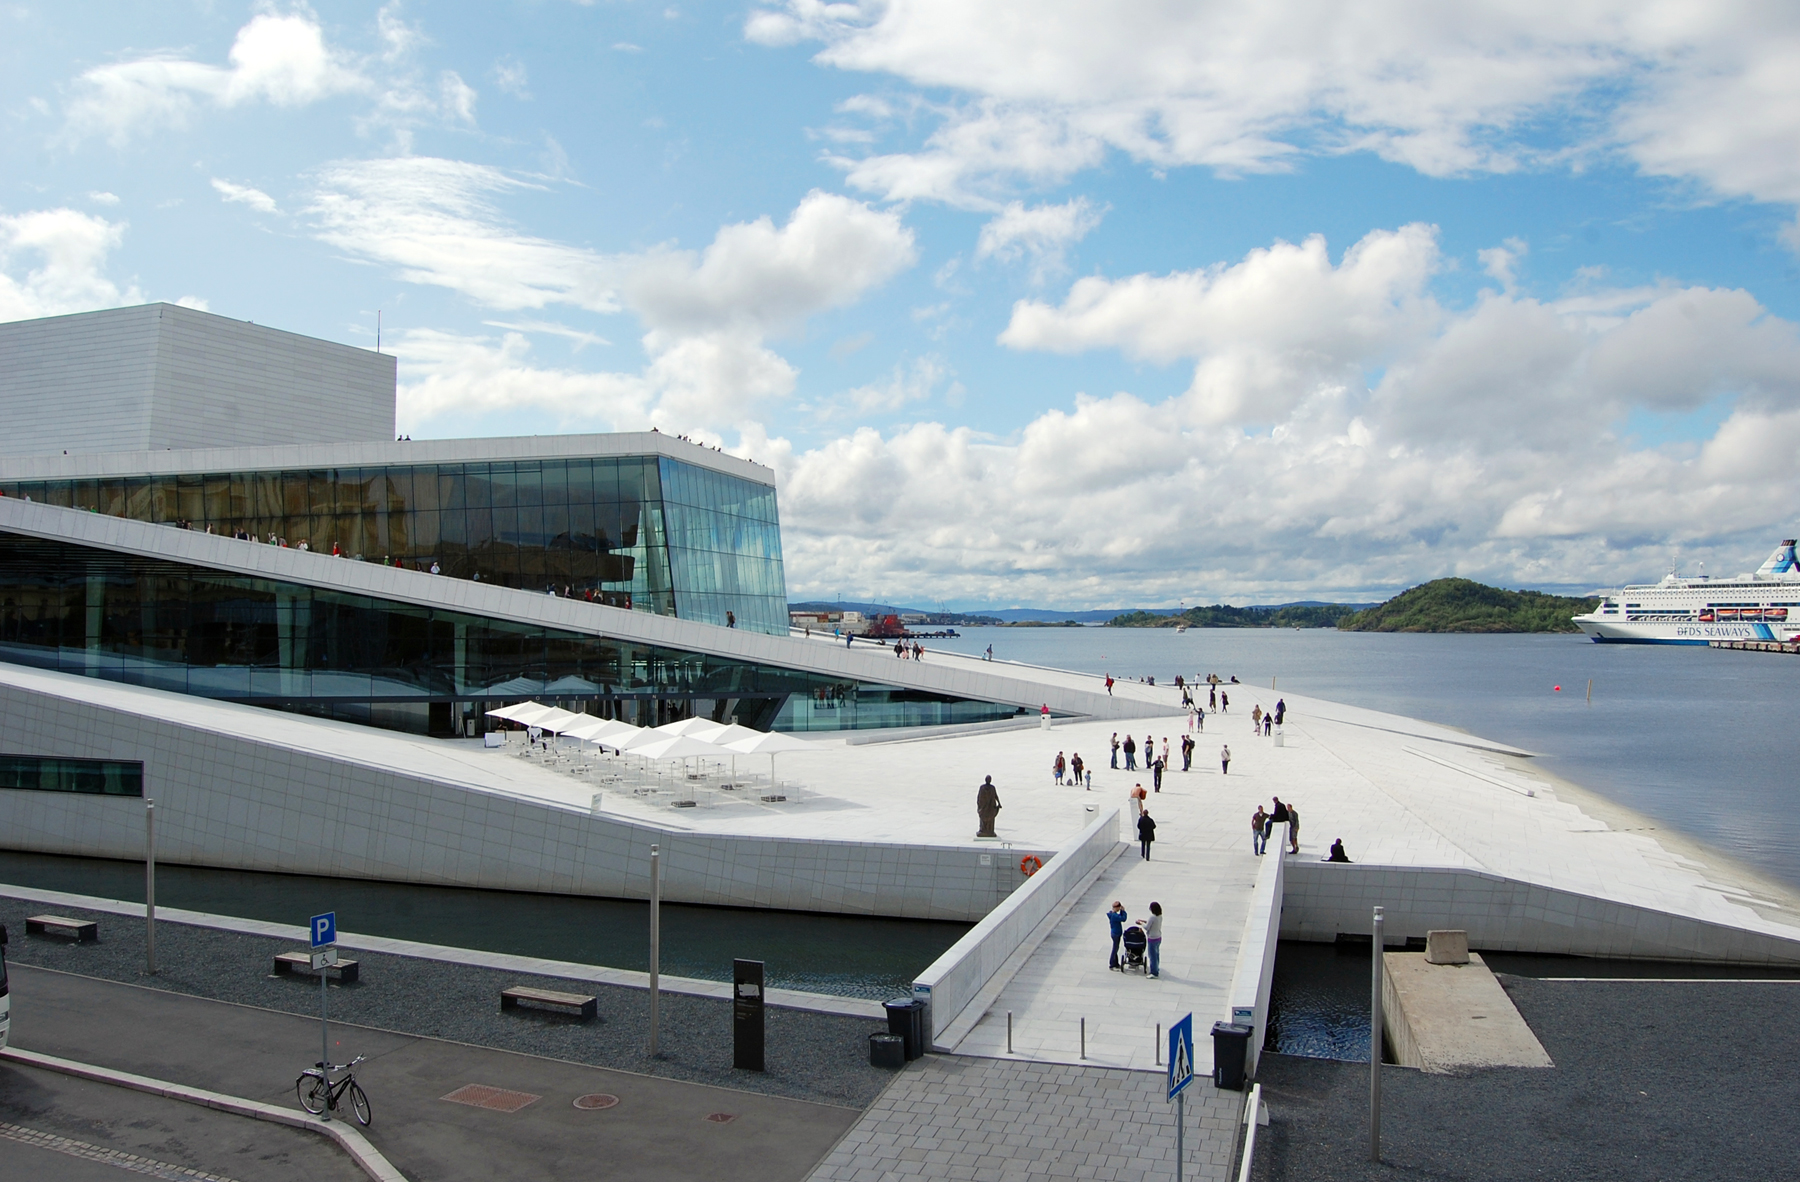 Opera din Oslo, vedere de ansamblu